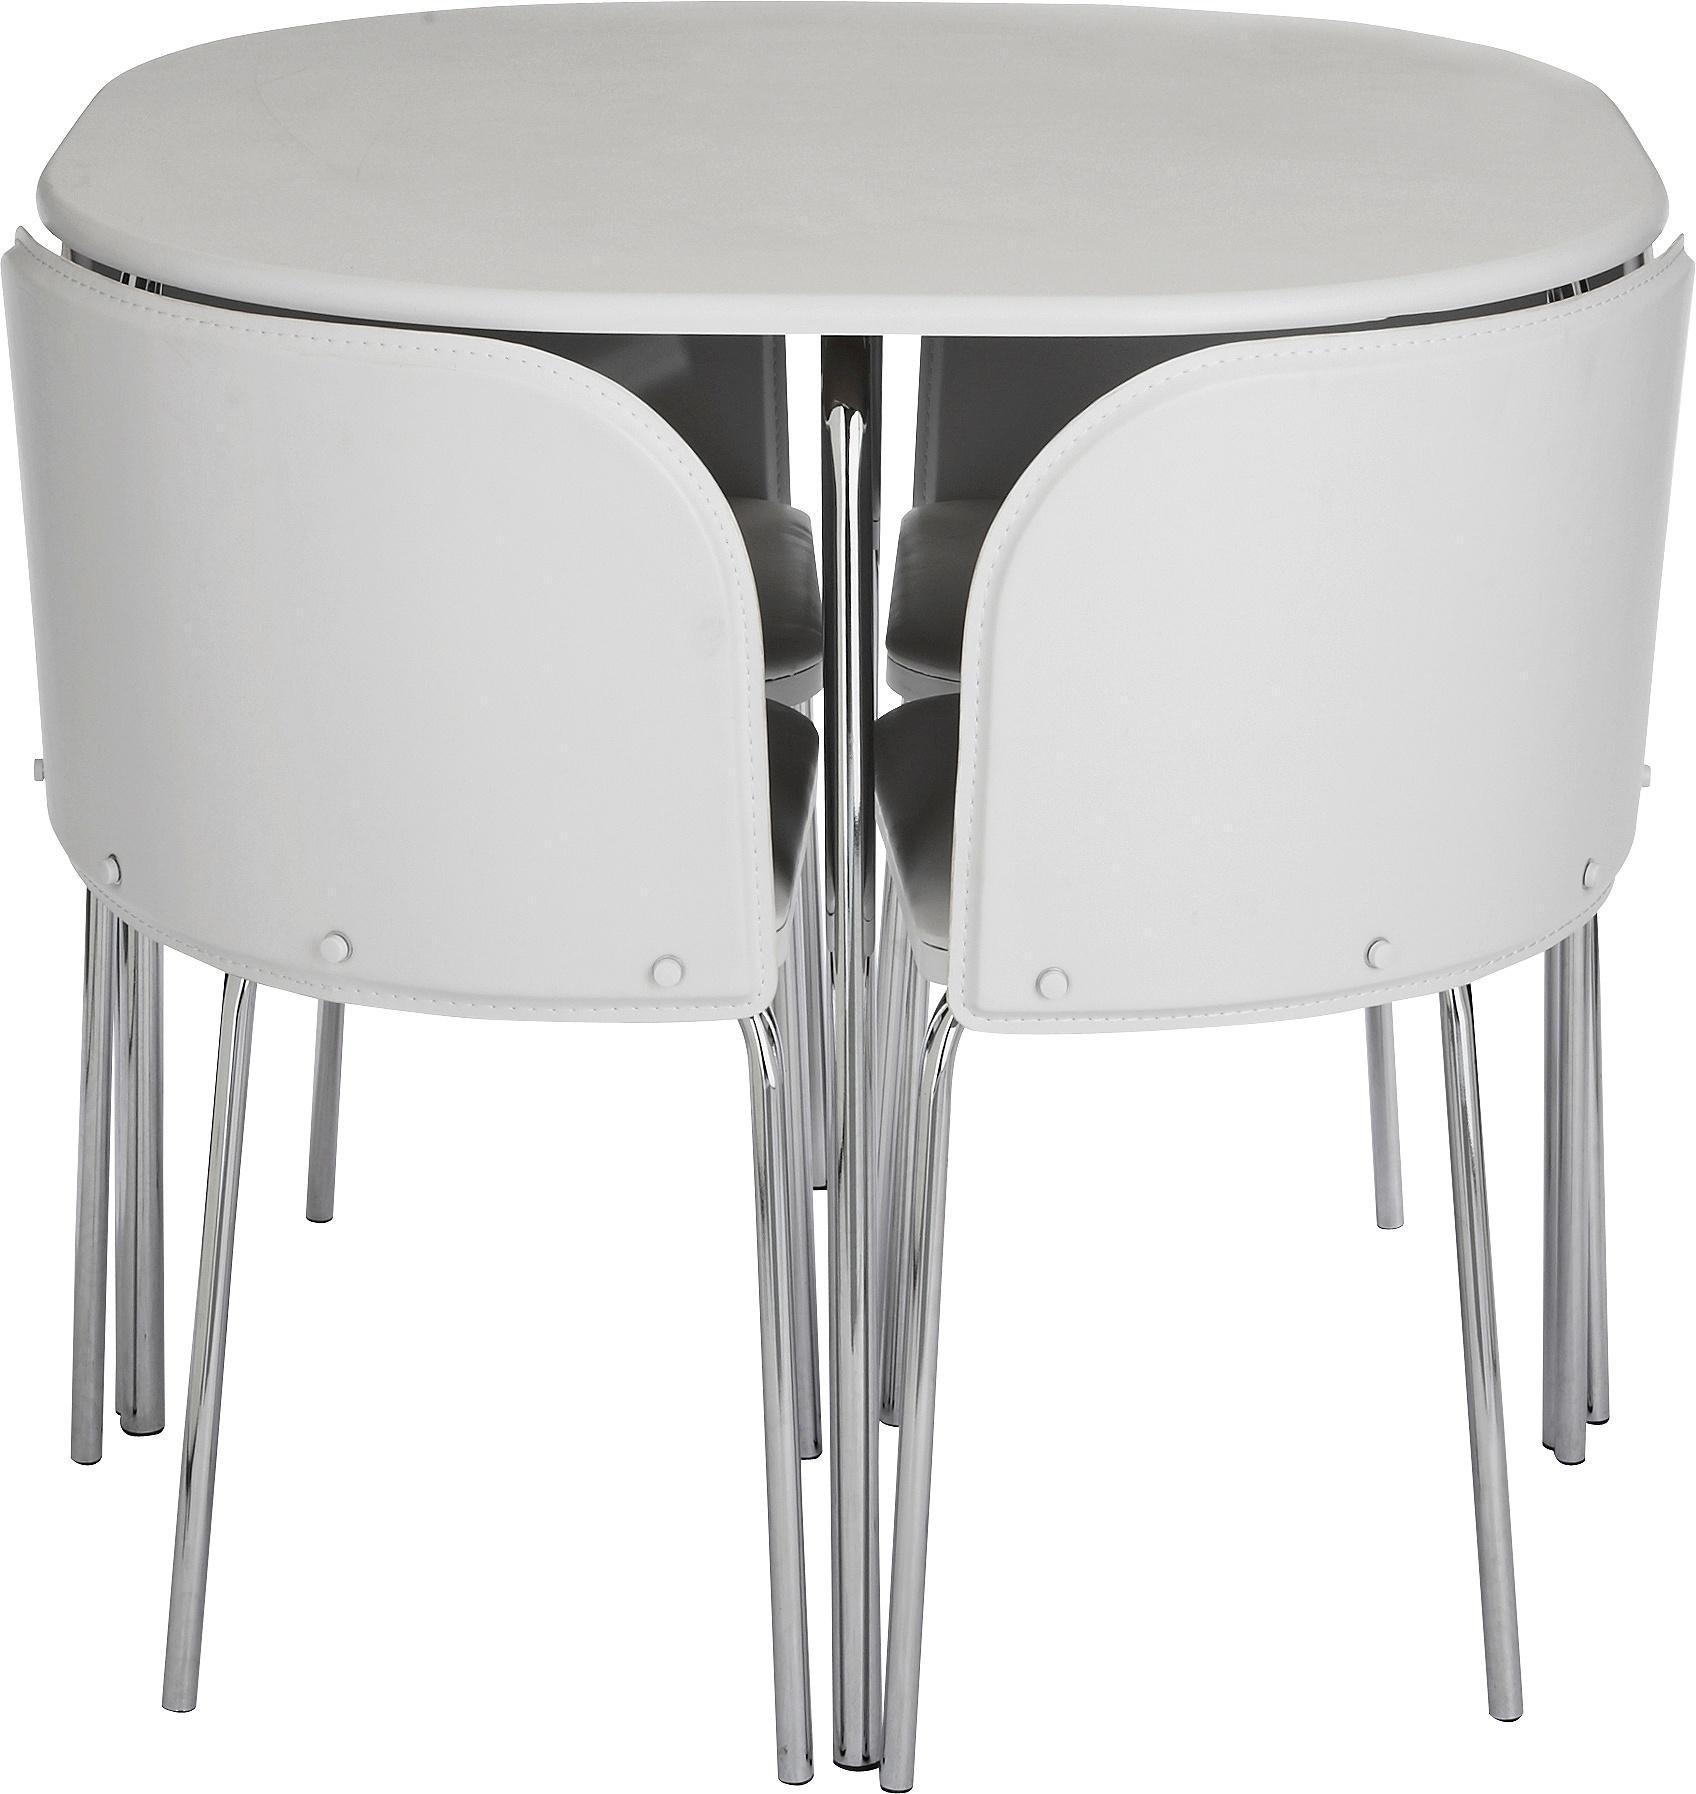 Buy Hygena Amparo Dining Table   Chairs - White at Argos.uk